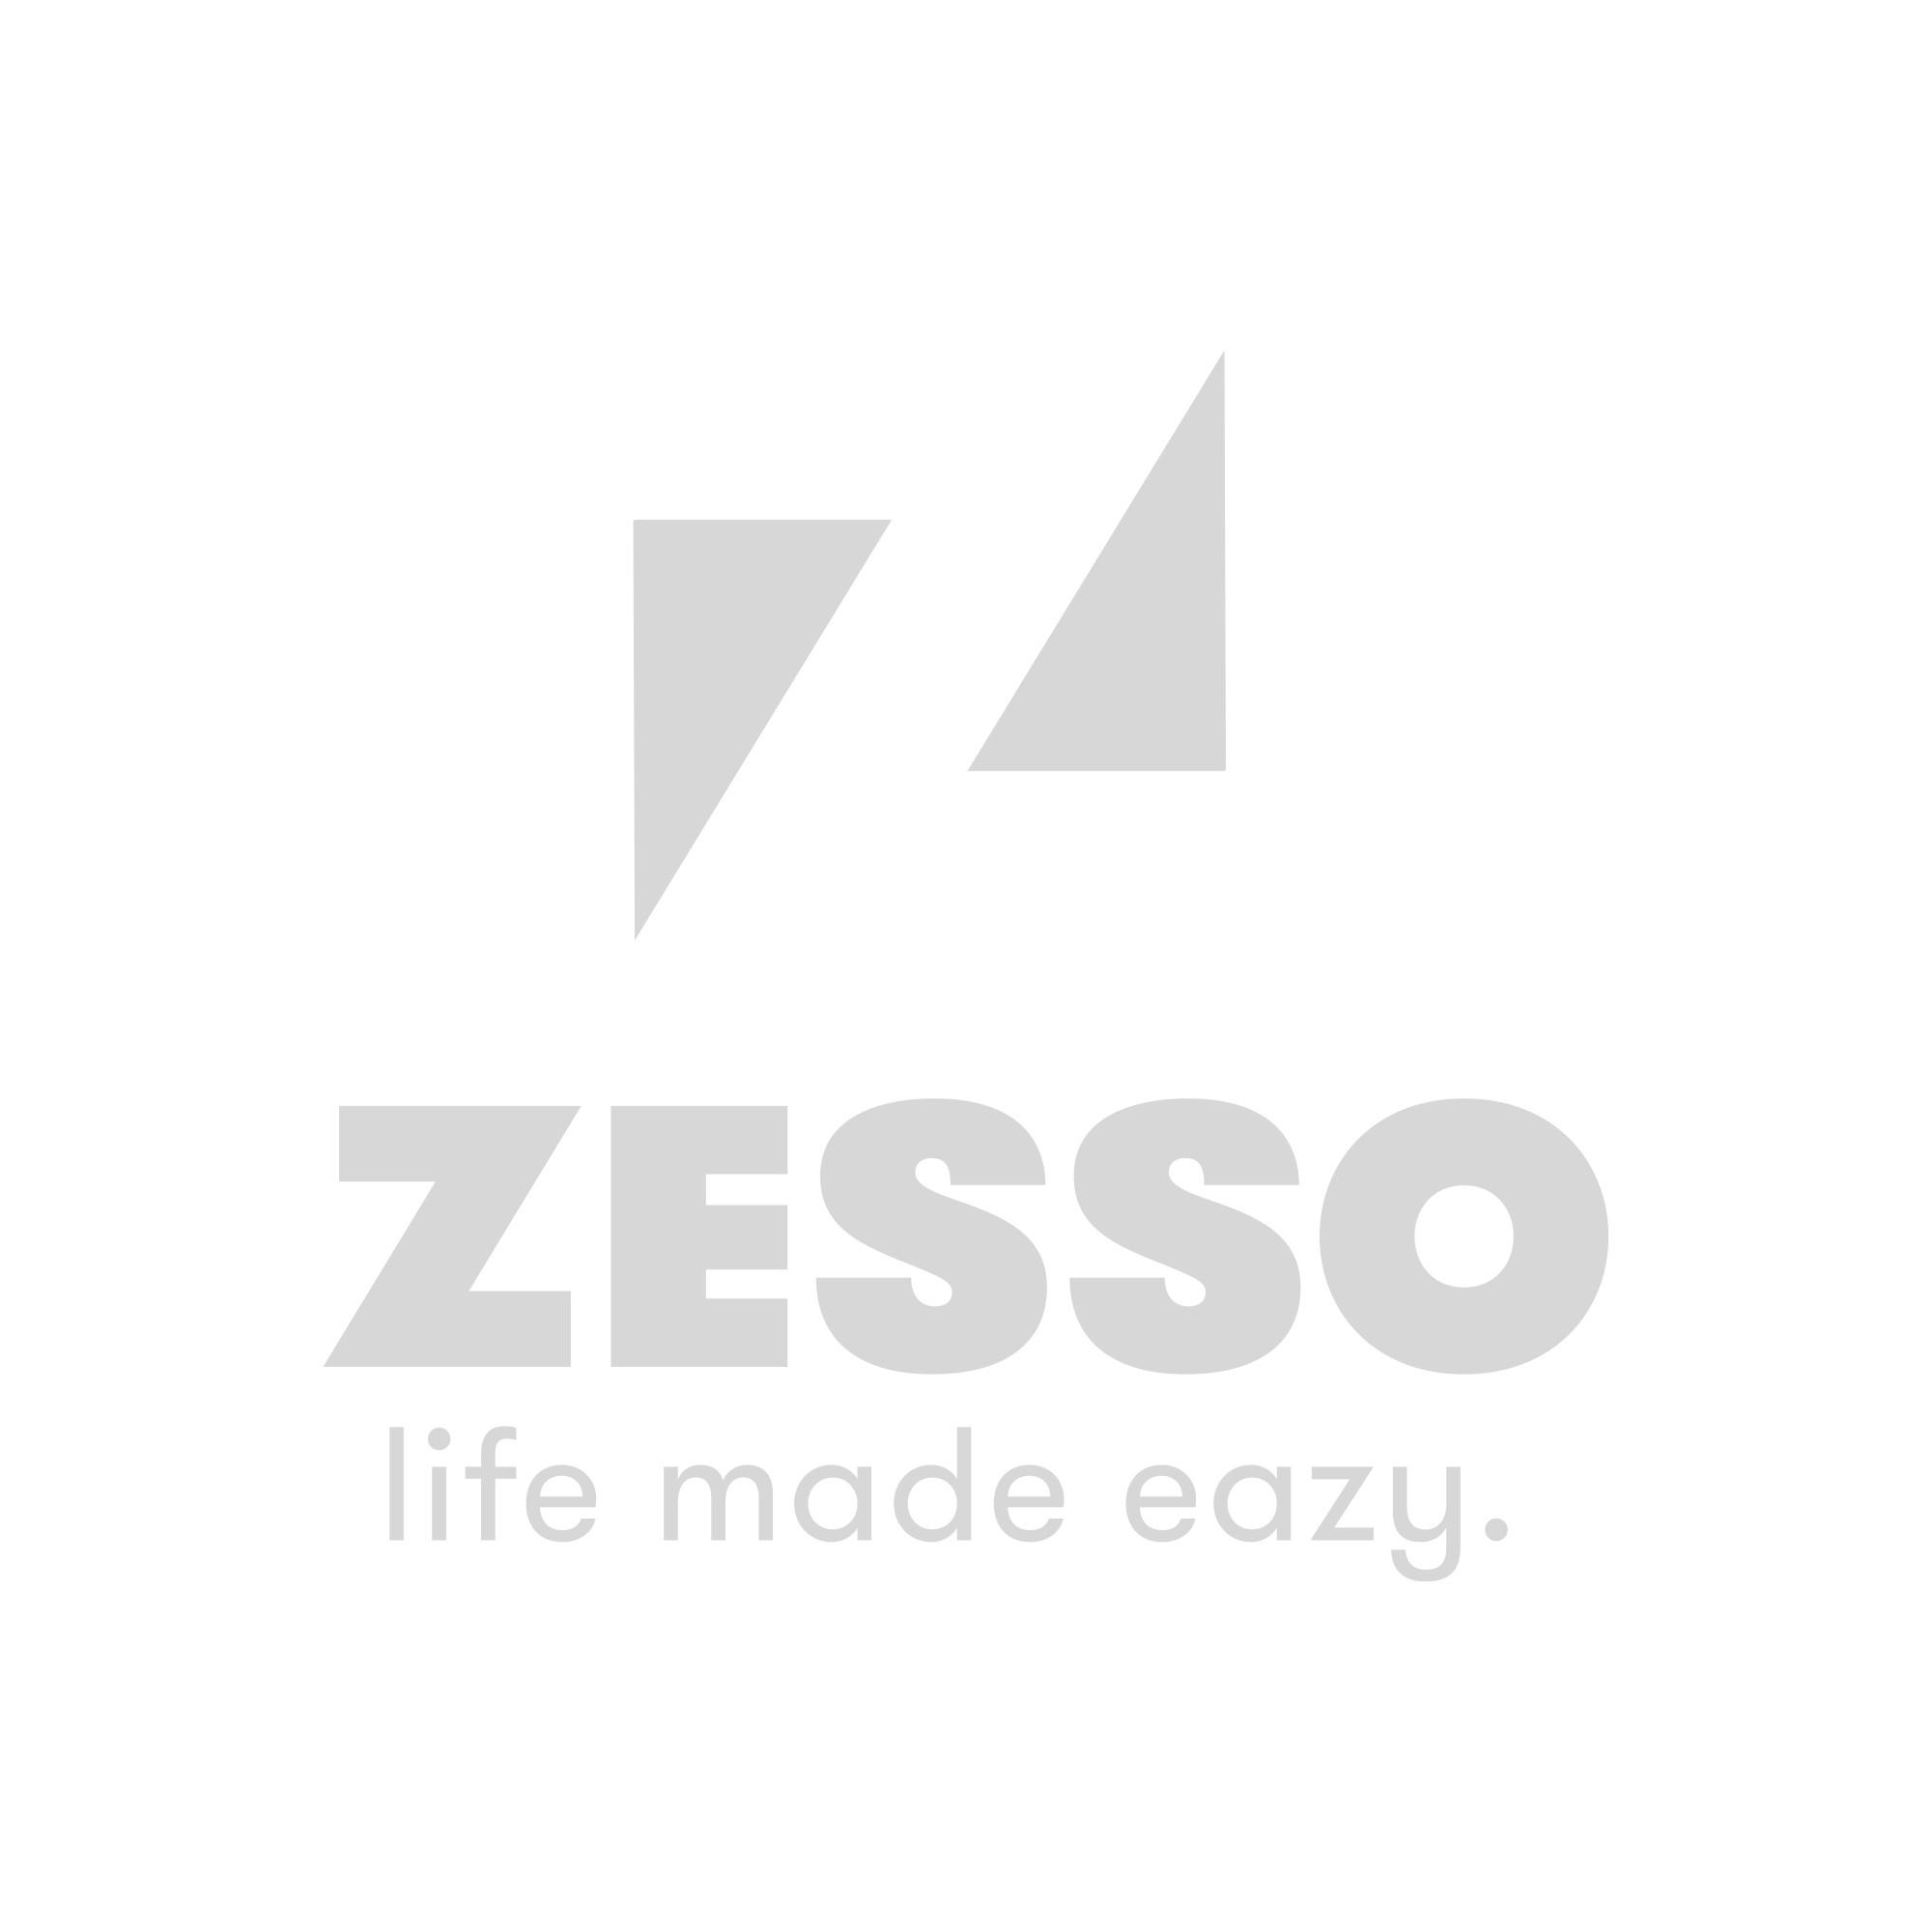 AeroMoov Campingbed Instant Reisbed Grey Rock